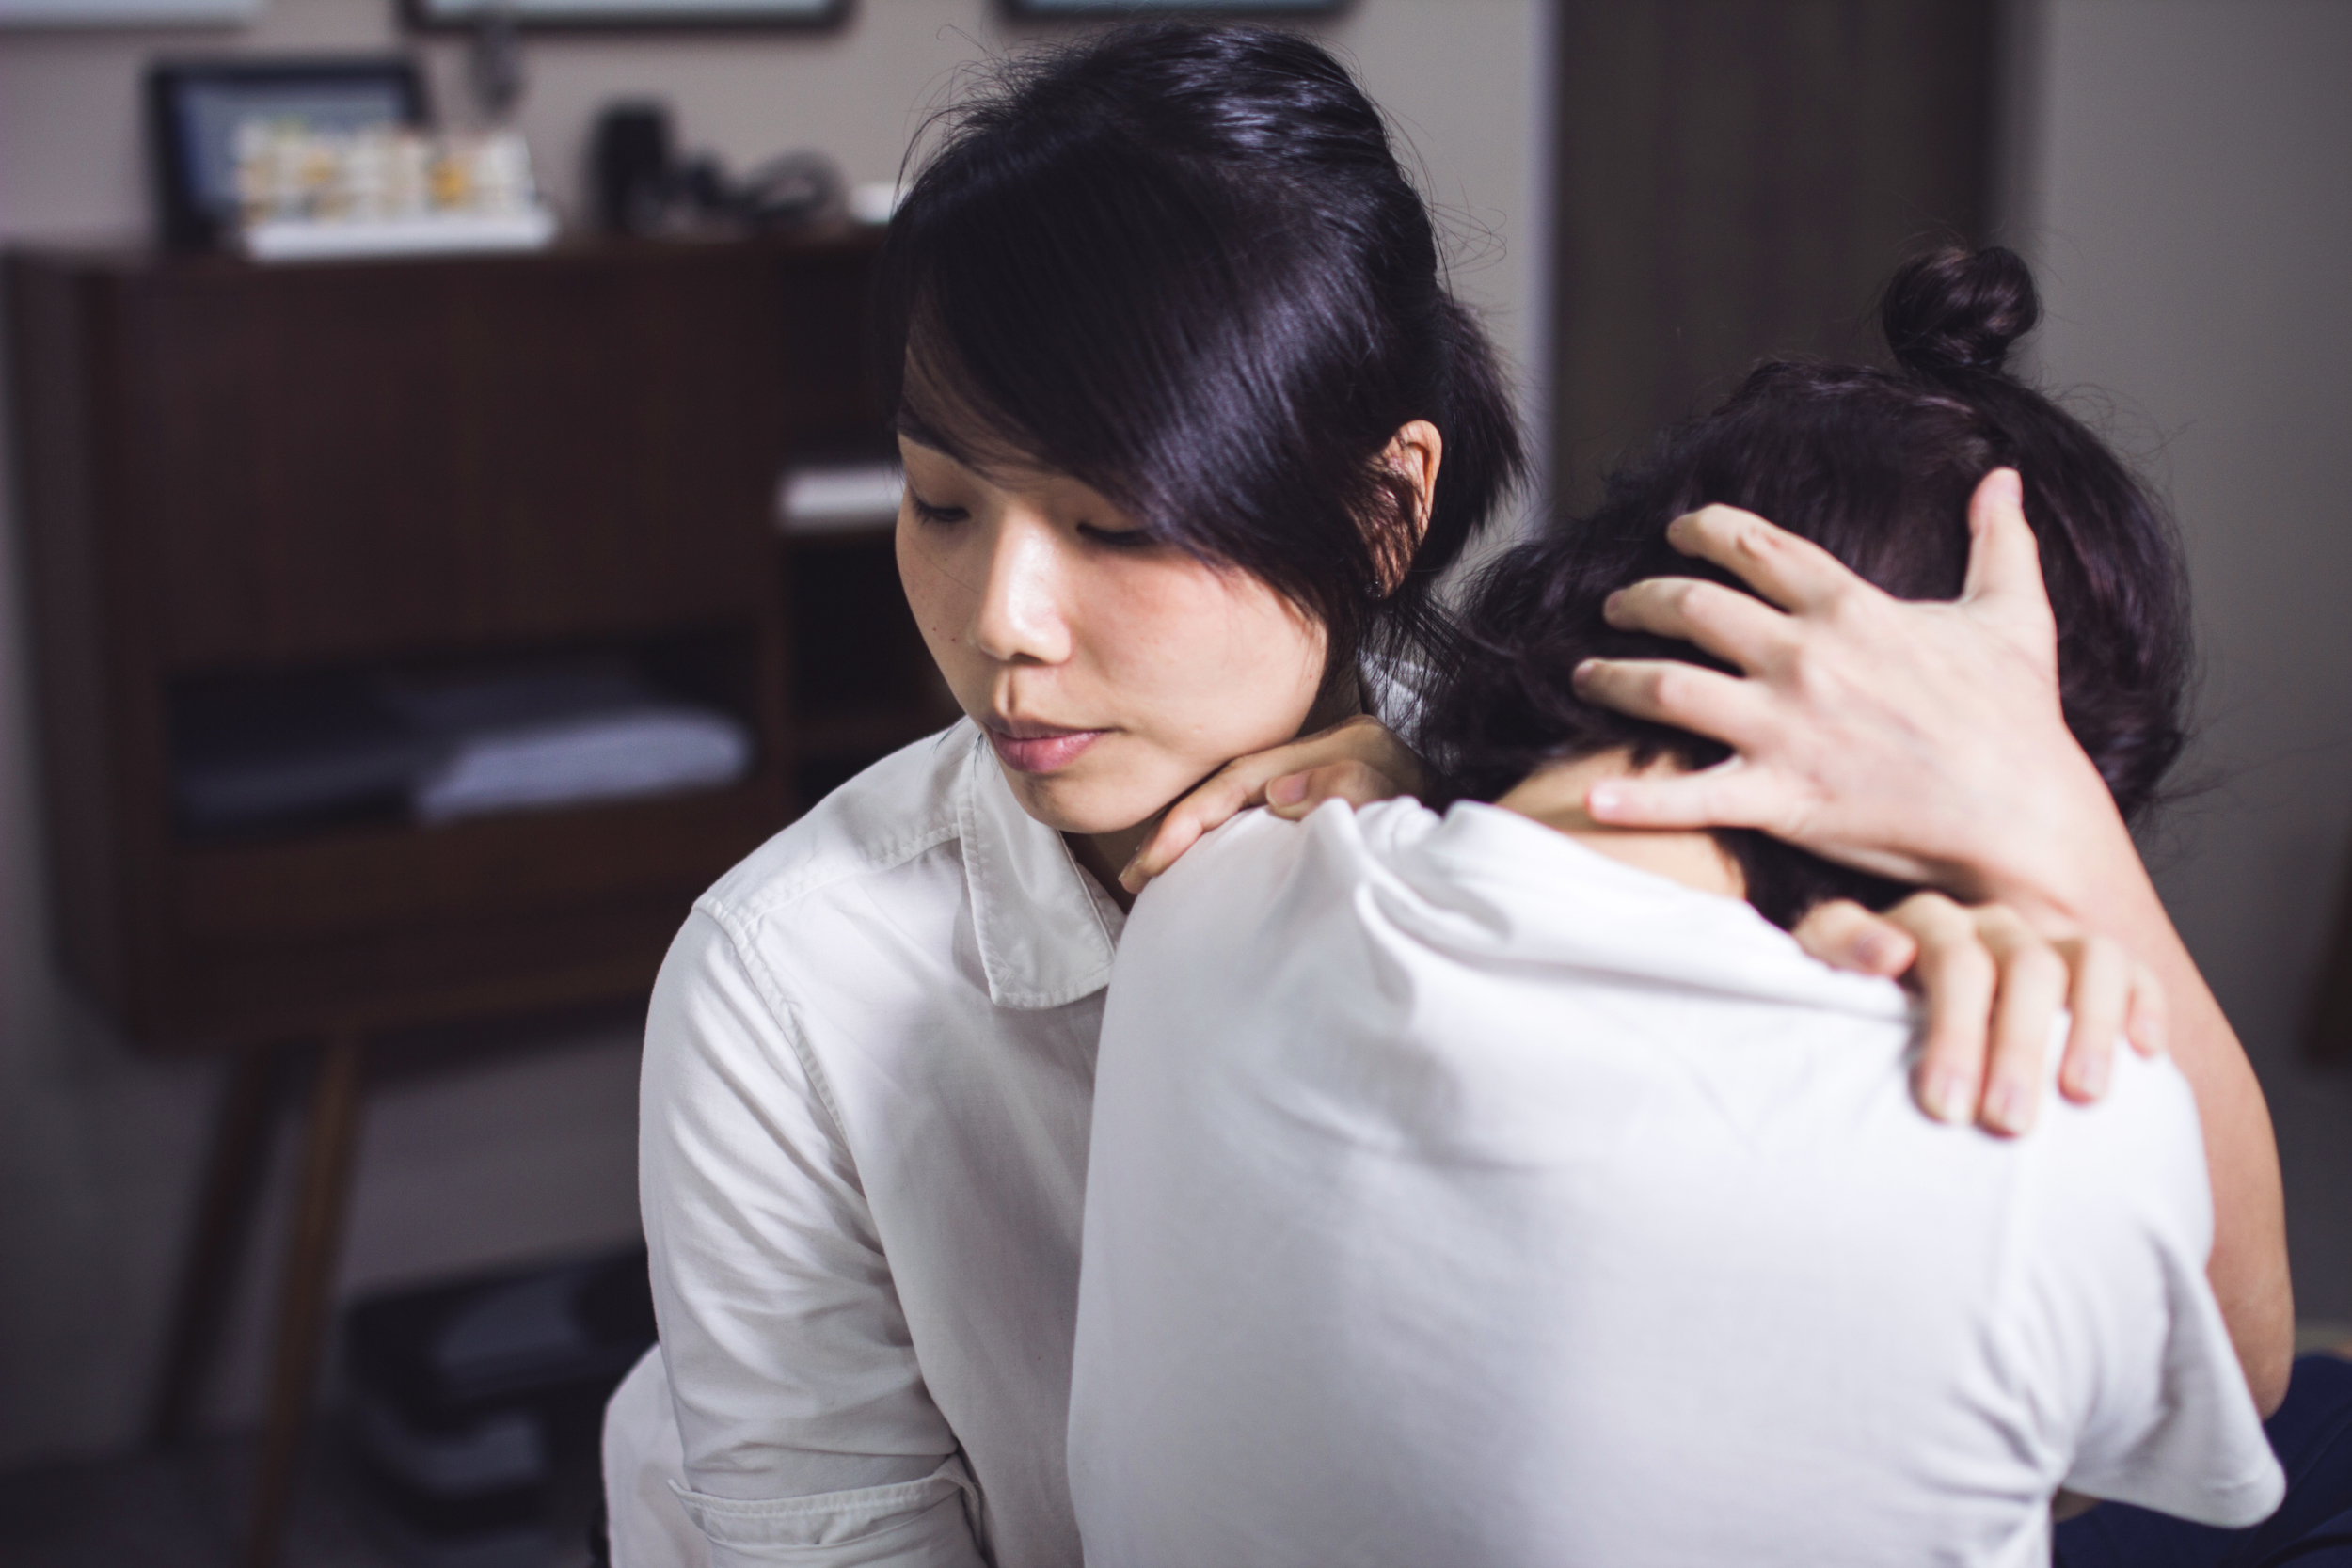 The Kairo Practice Chiropractic Clinic